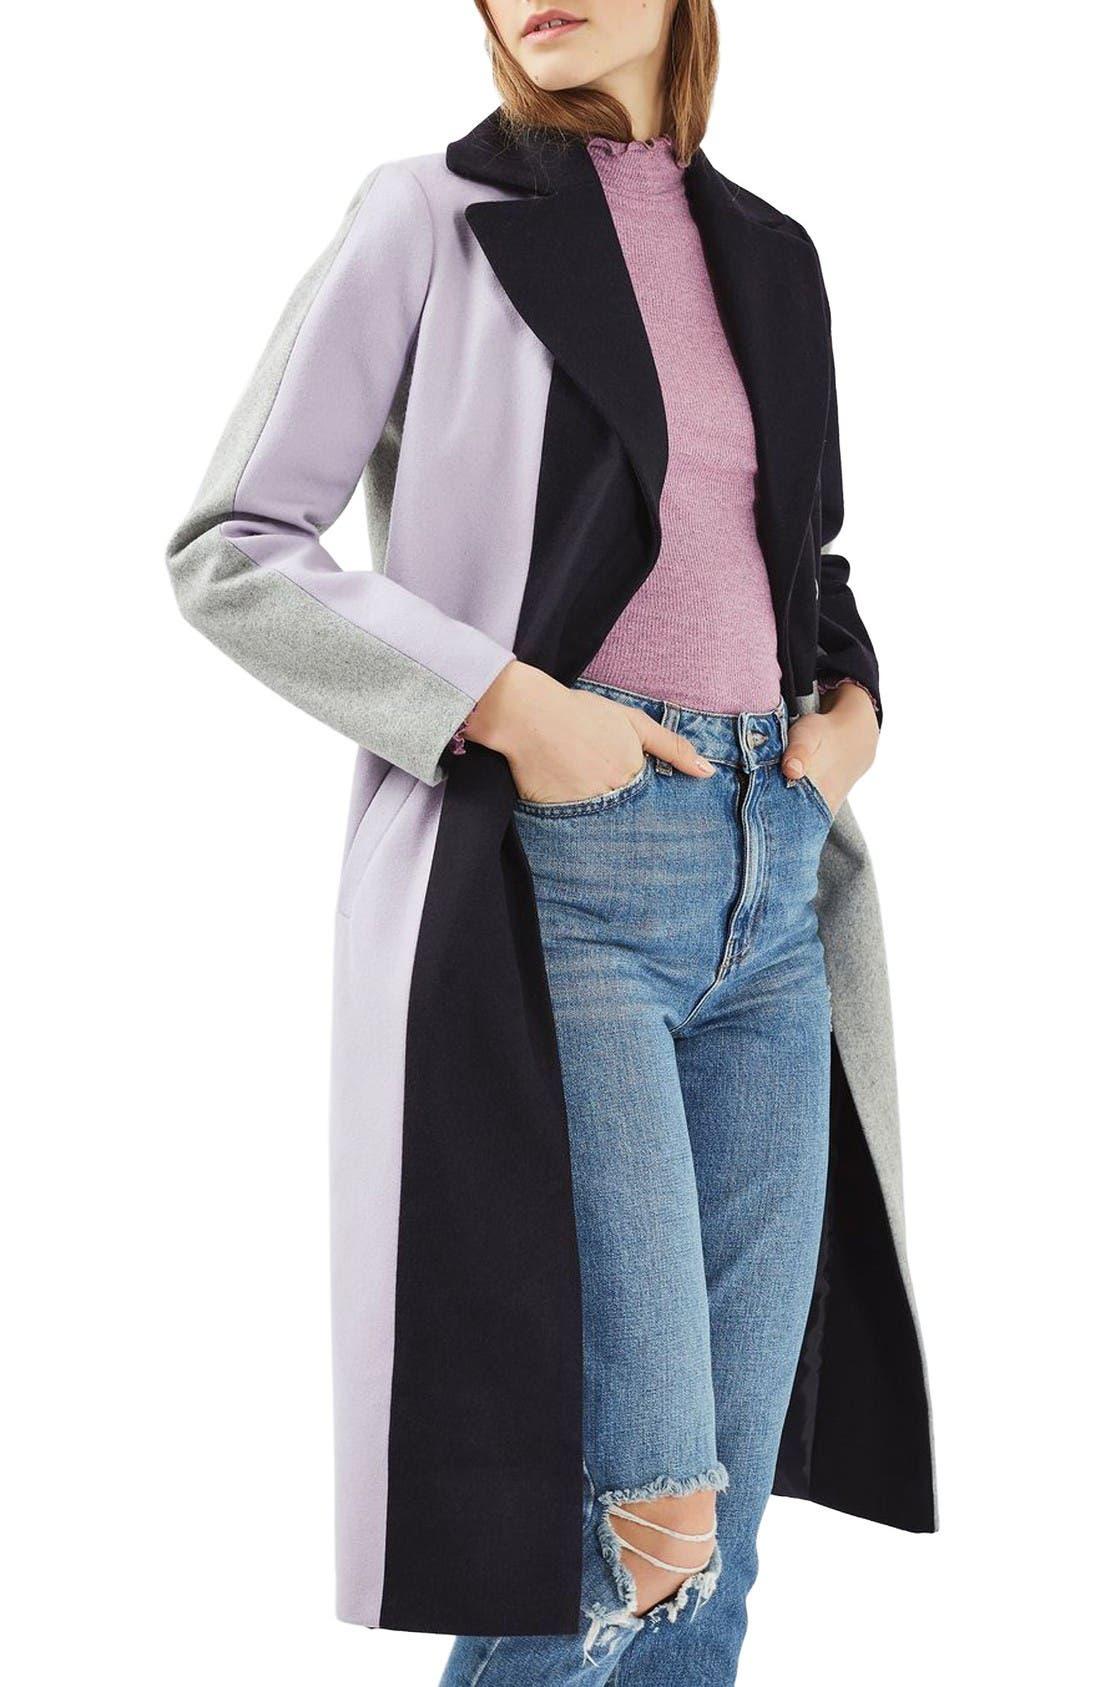 Alternate Image 1 Selected - Topshop Colorblock Wool Blend Coat